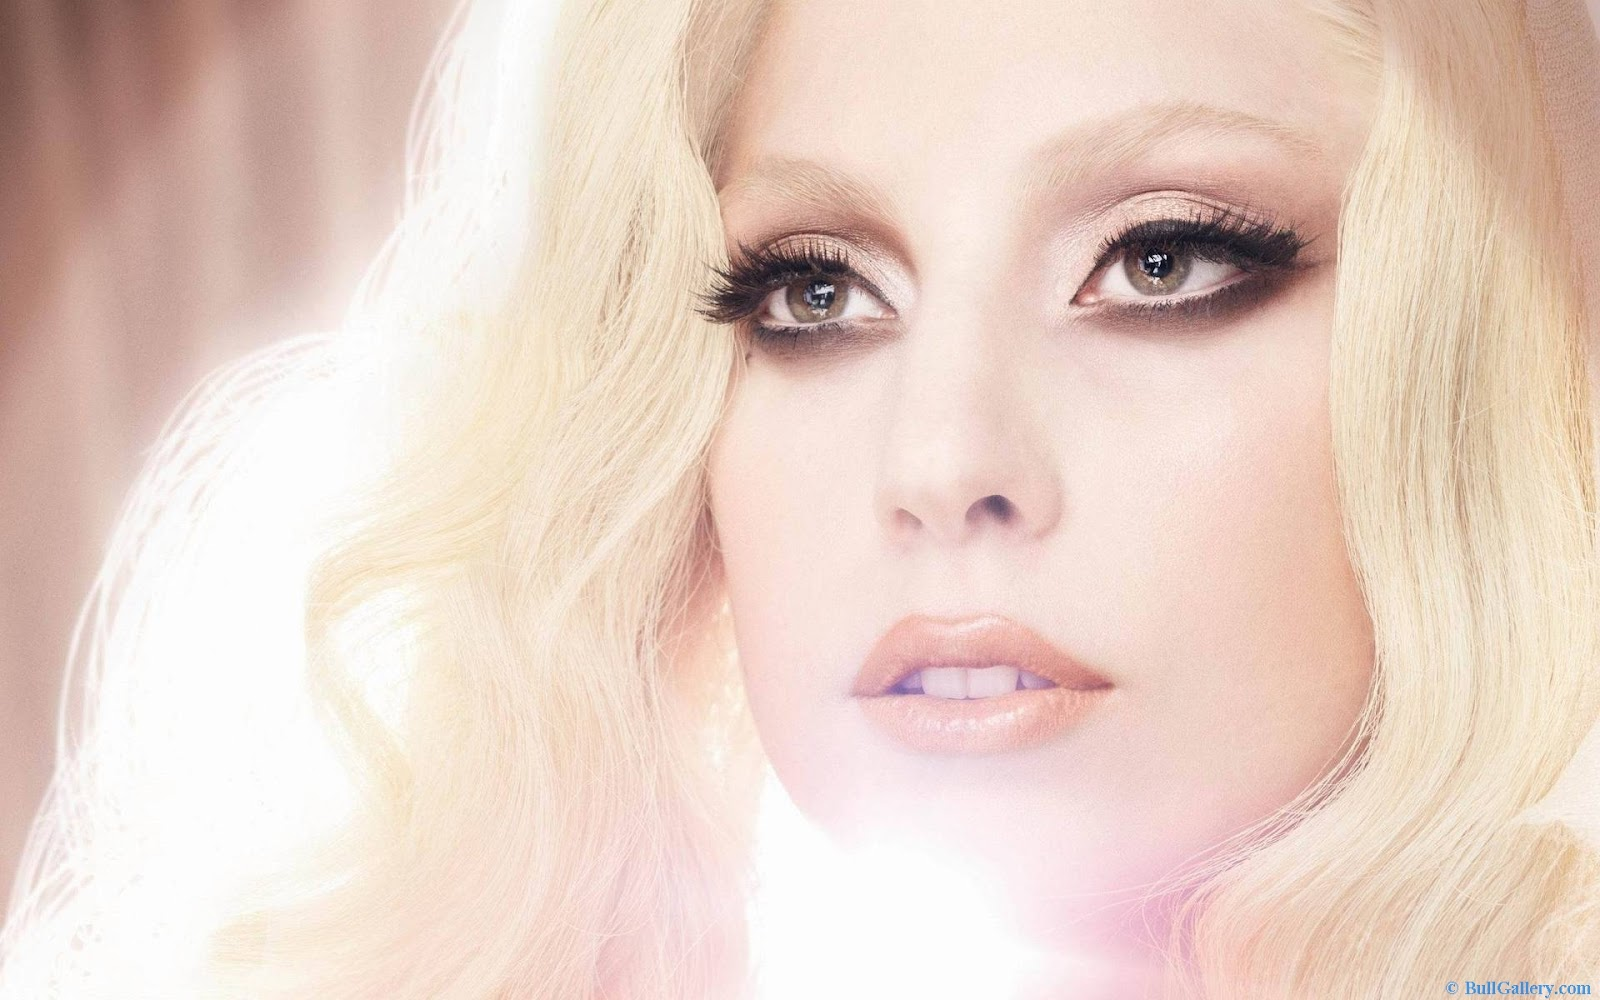 http://4.bp.blogspot.com/-RWzLvudbJAU/UGK2_MBXLbI/AAAAAAAAEs0/J3VMuUuMFvQ/s1600/lady-Gaga-High-Resolution-Pictures.jpg